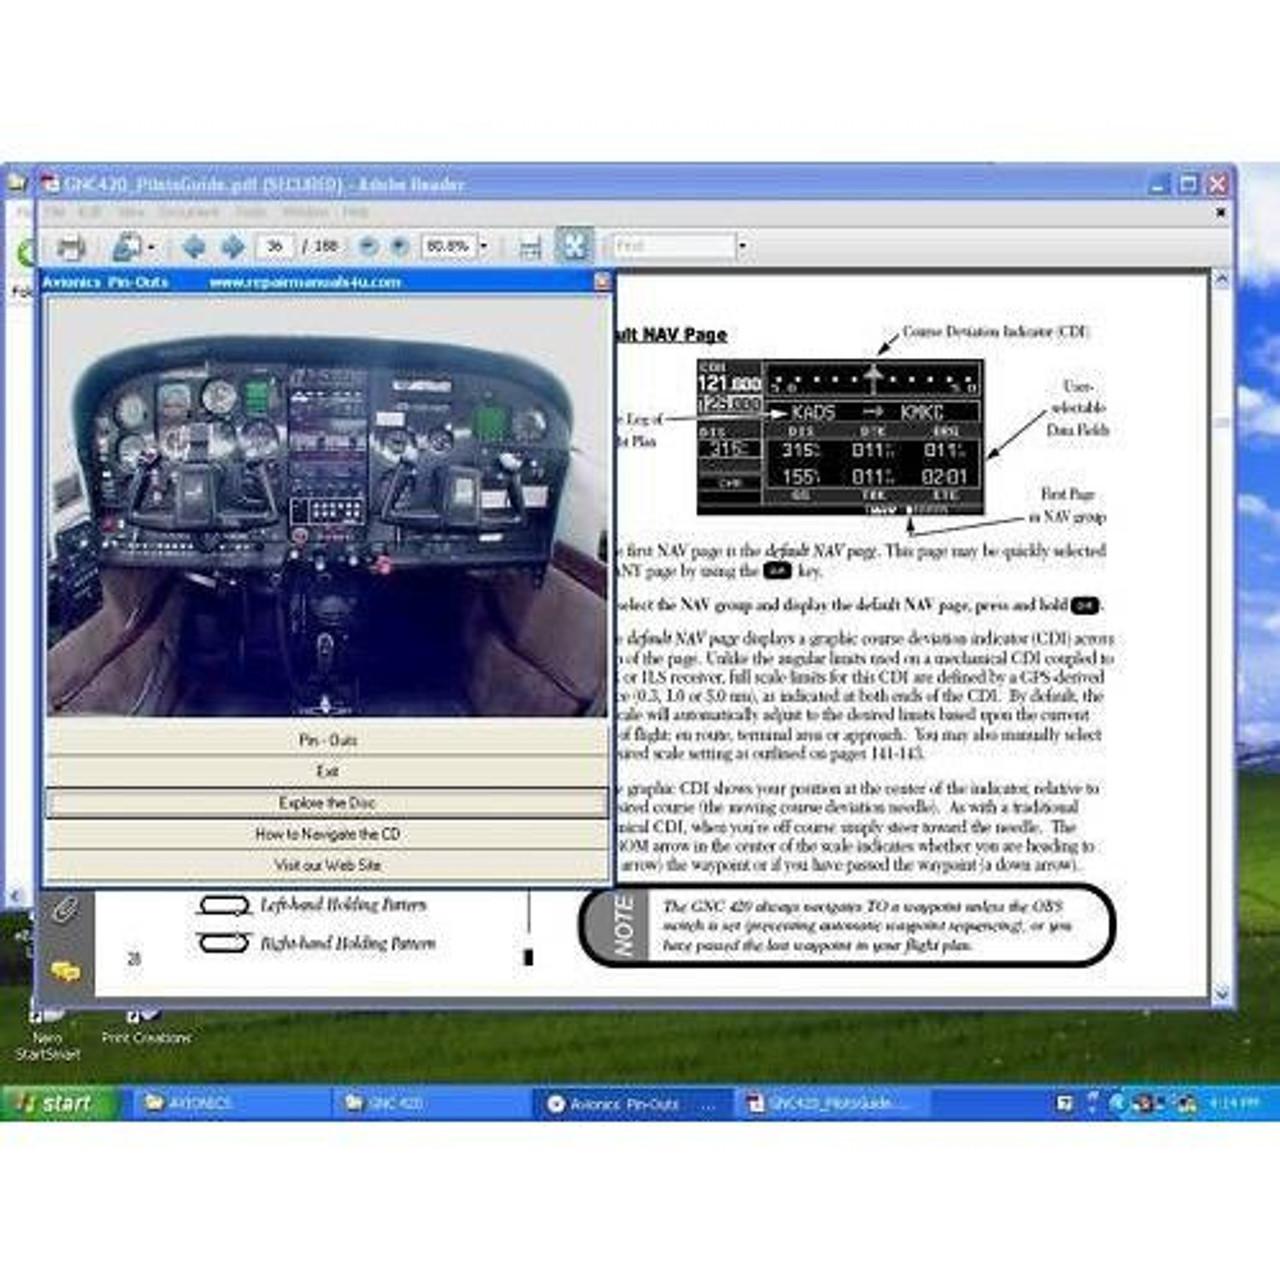 Pleasant Avionics Technicians Hand Book Pin Outs Wiring Gps Nav Com Txp Encoder G S Audio Wiring Cloud Hisonuggs Outletorg